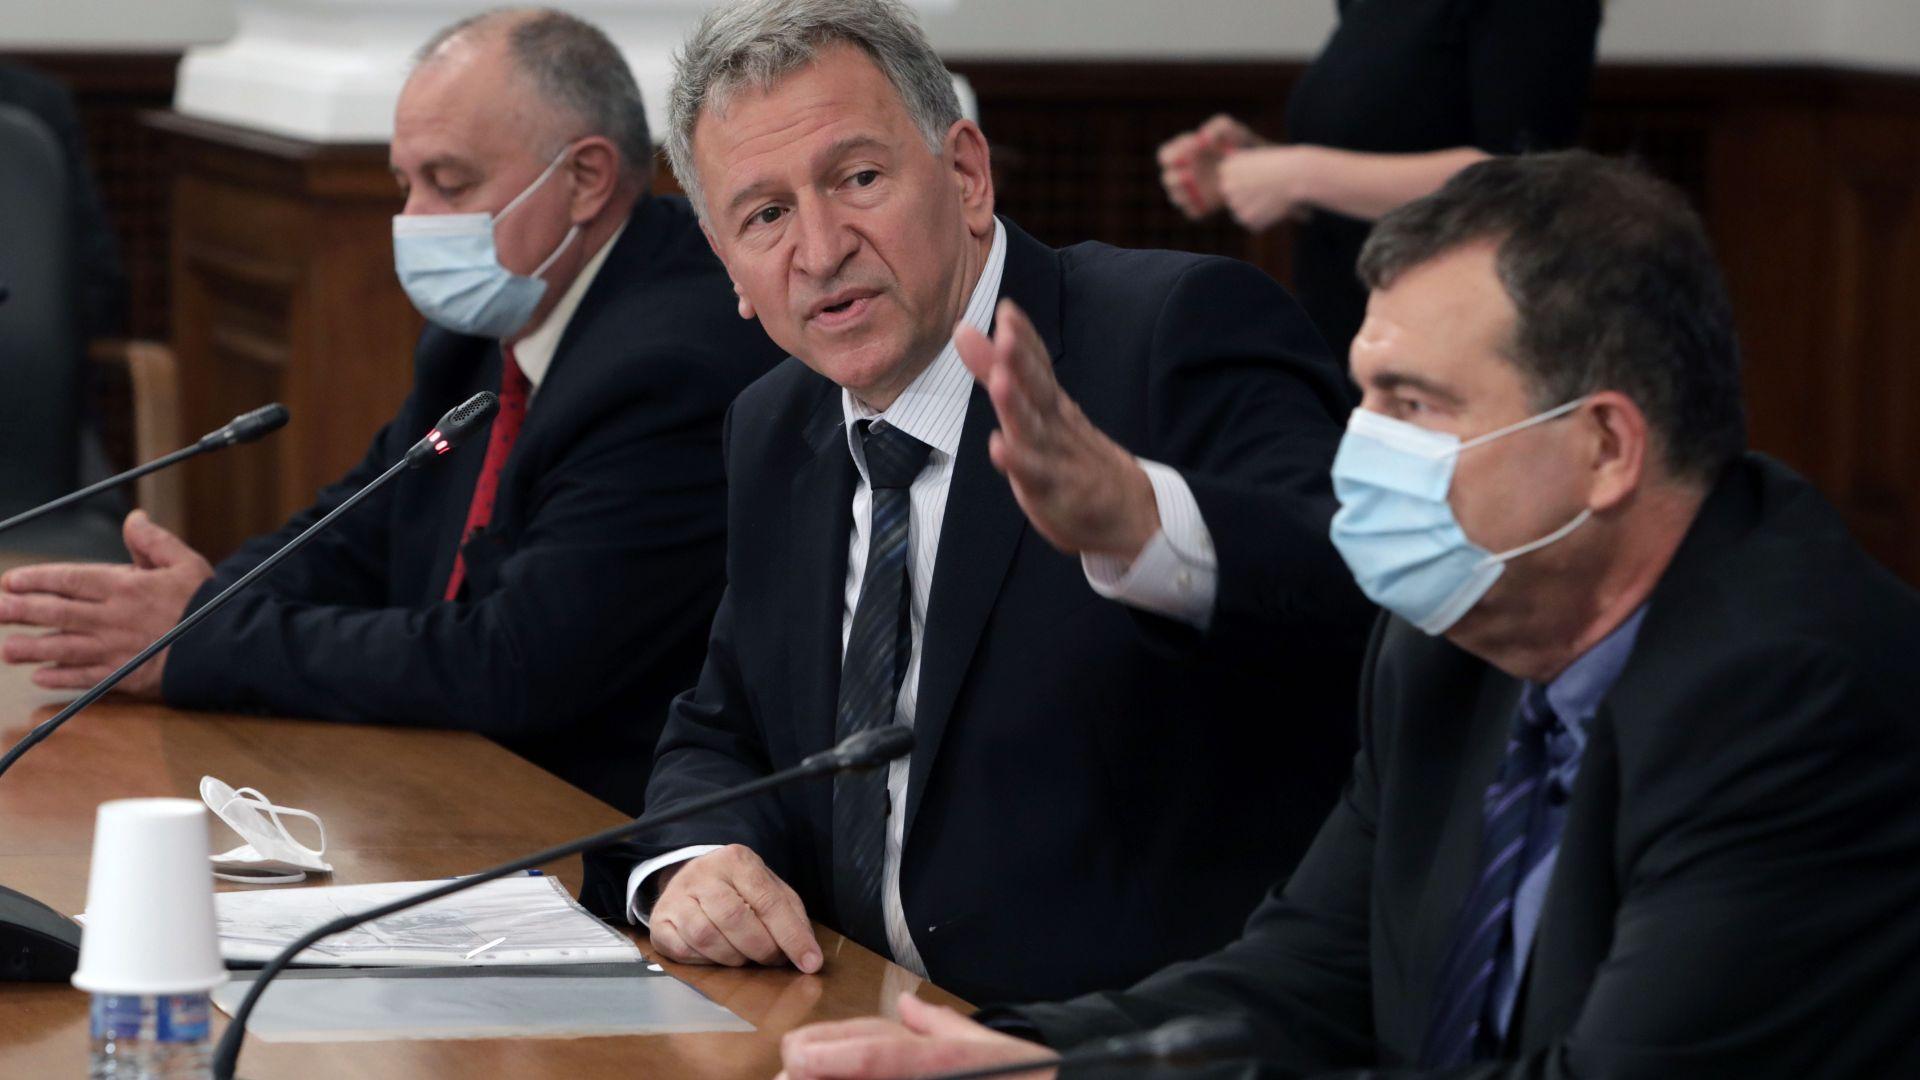 Кацаров: Ананиев, Ангелов, ДАНС и МВР са покровителствали трафика на органи и незаконните трансплантации